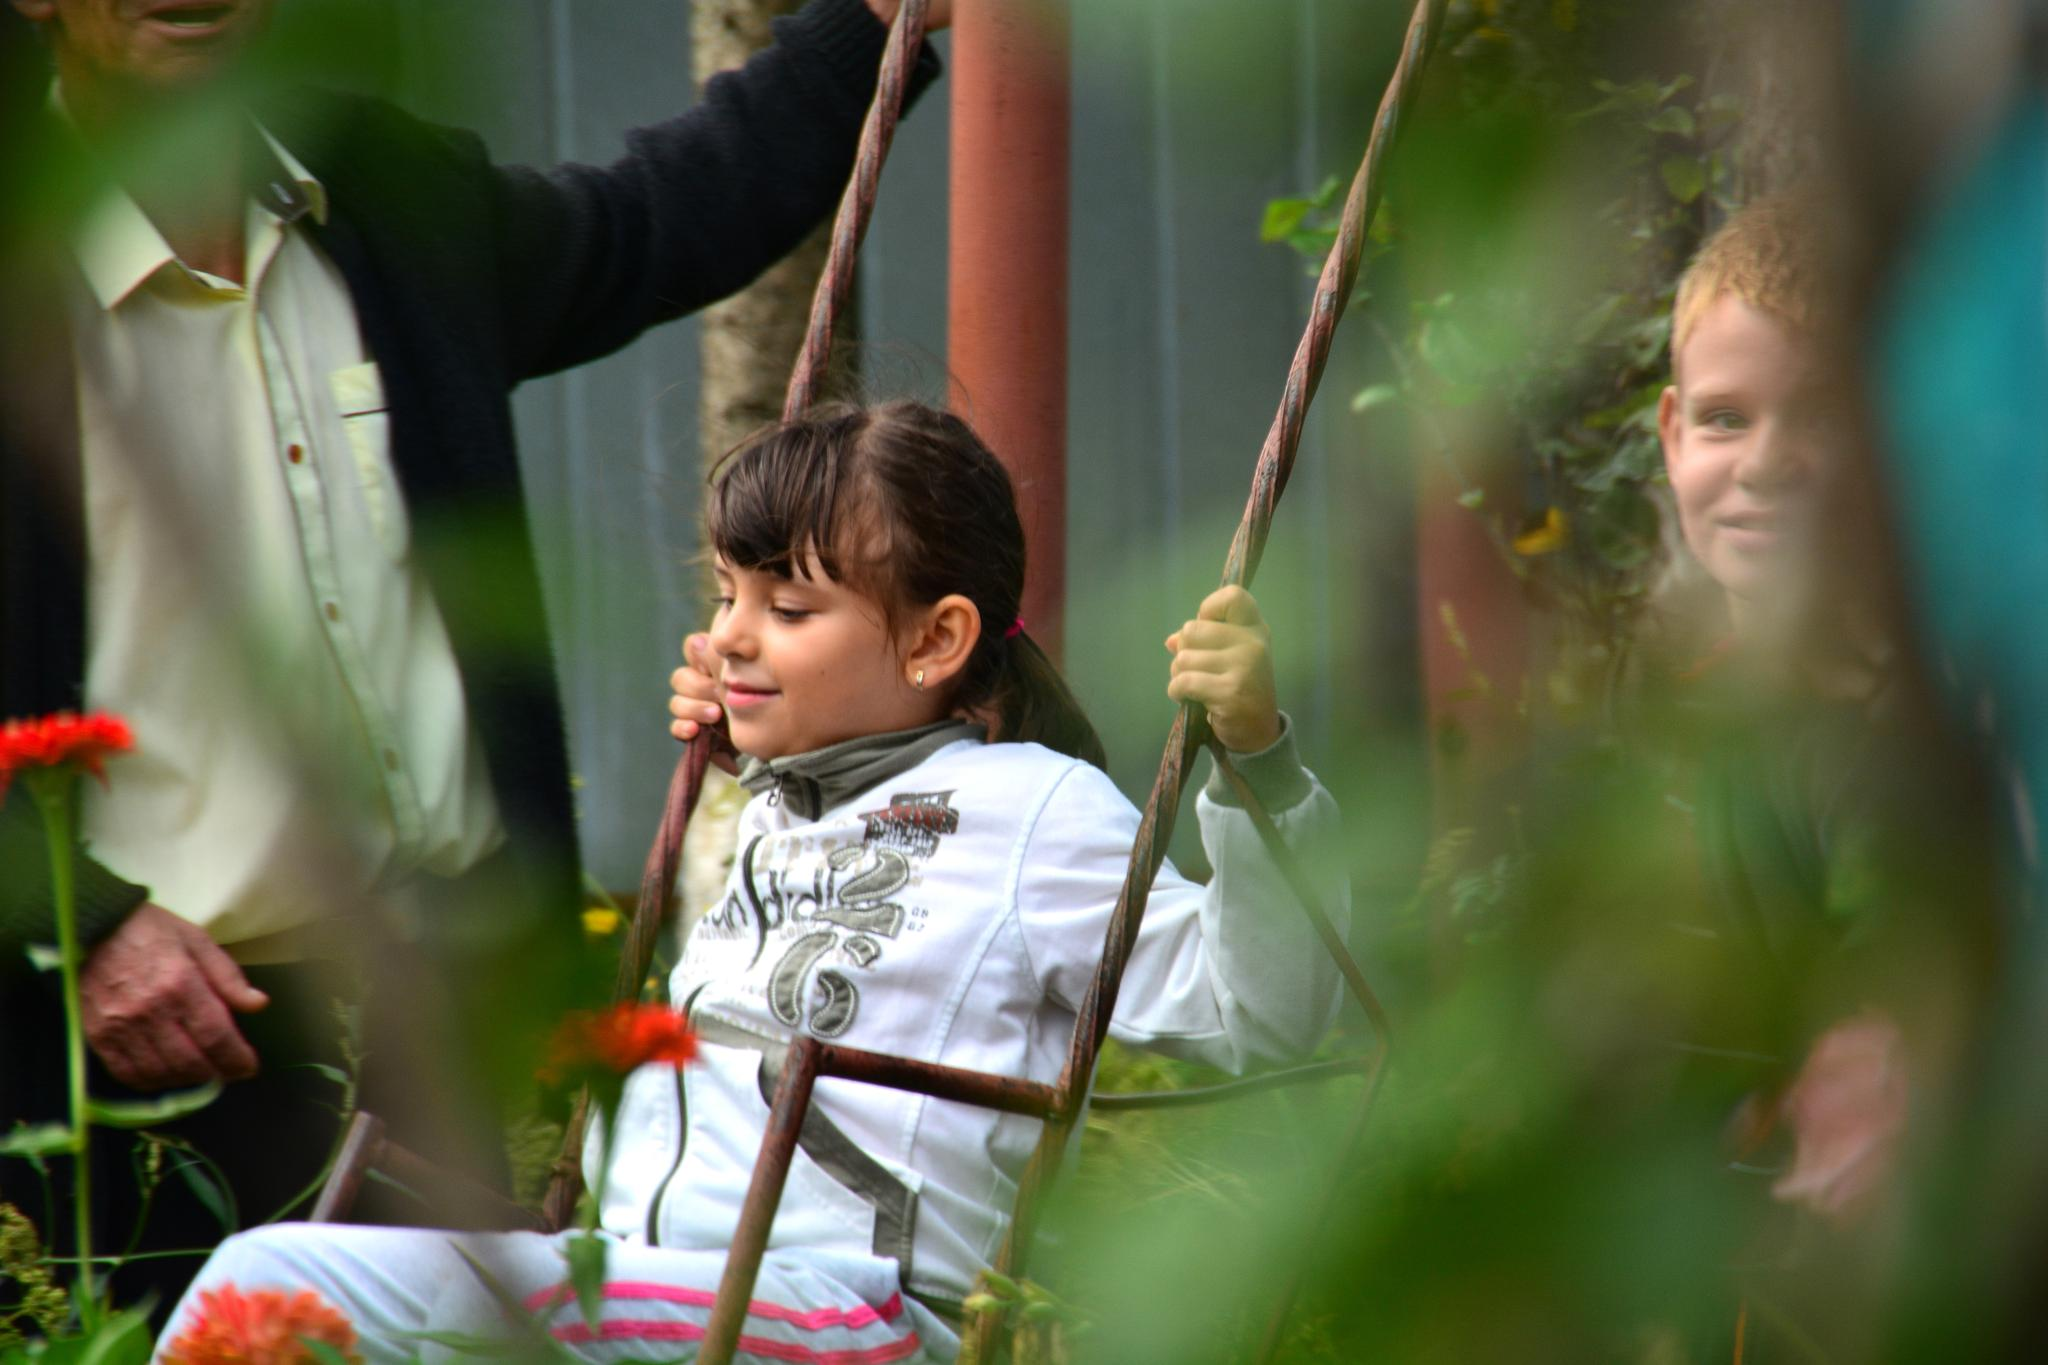 Childrens playing by Silviu Calistru